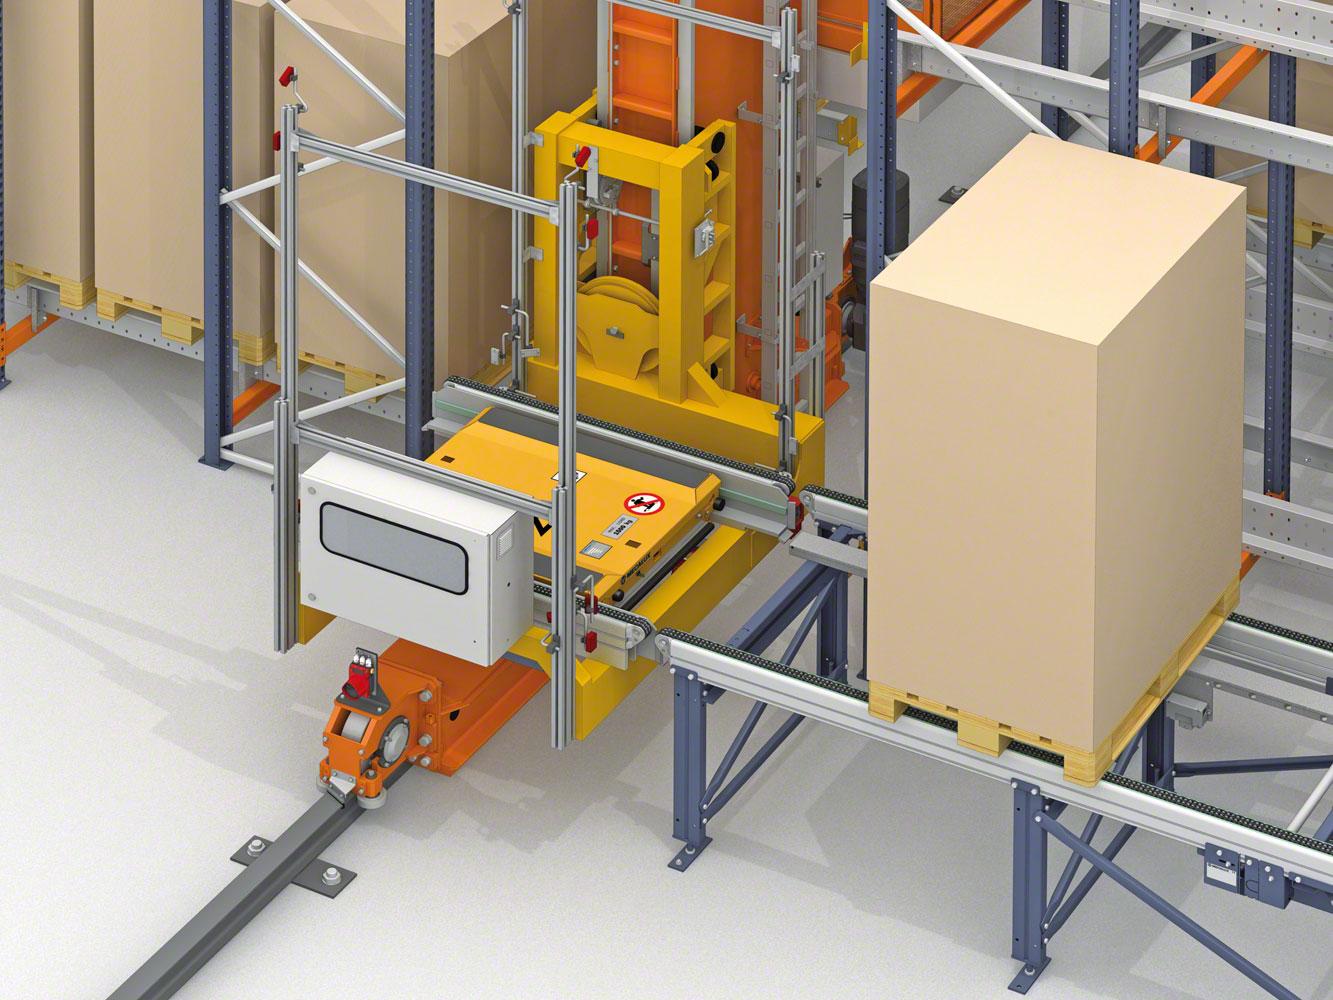 Mecalux equipará dos depósitos de Lanxess en Alemania